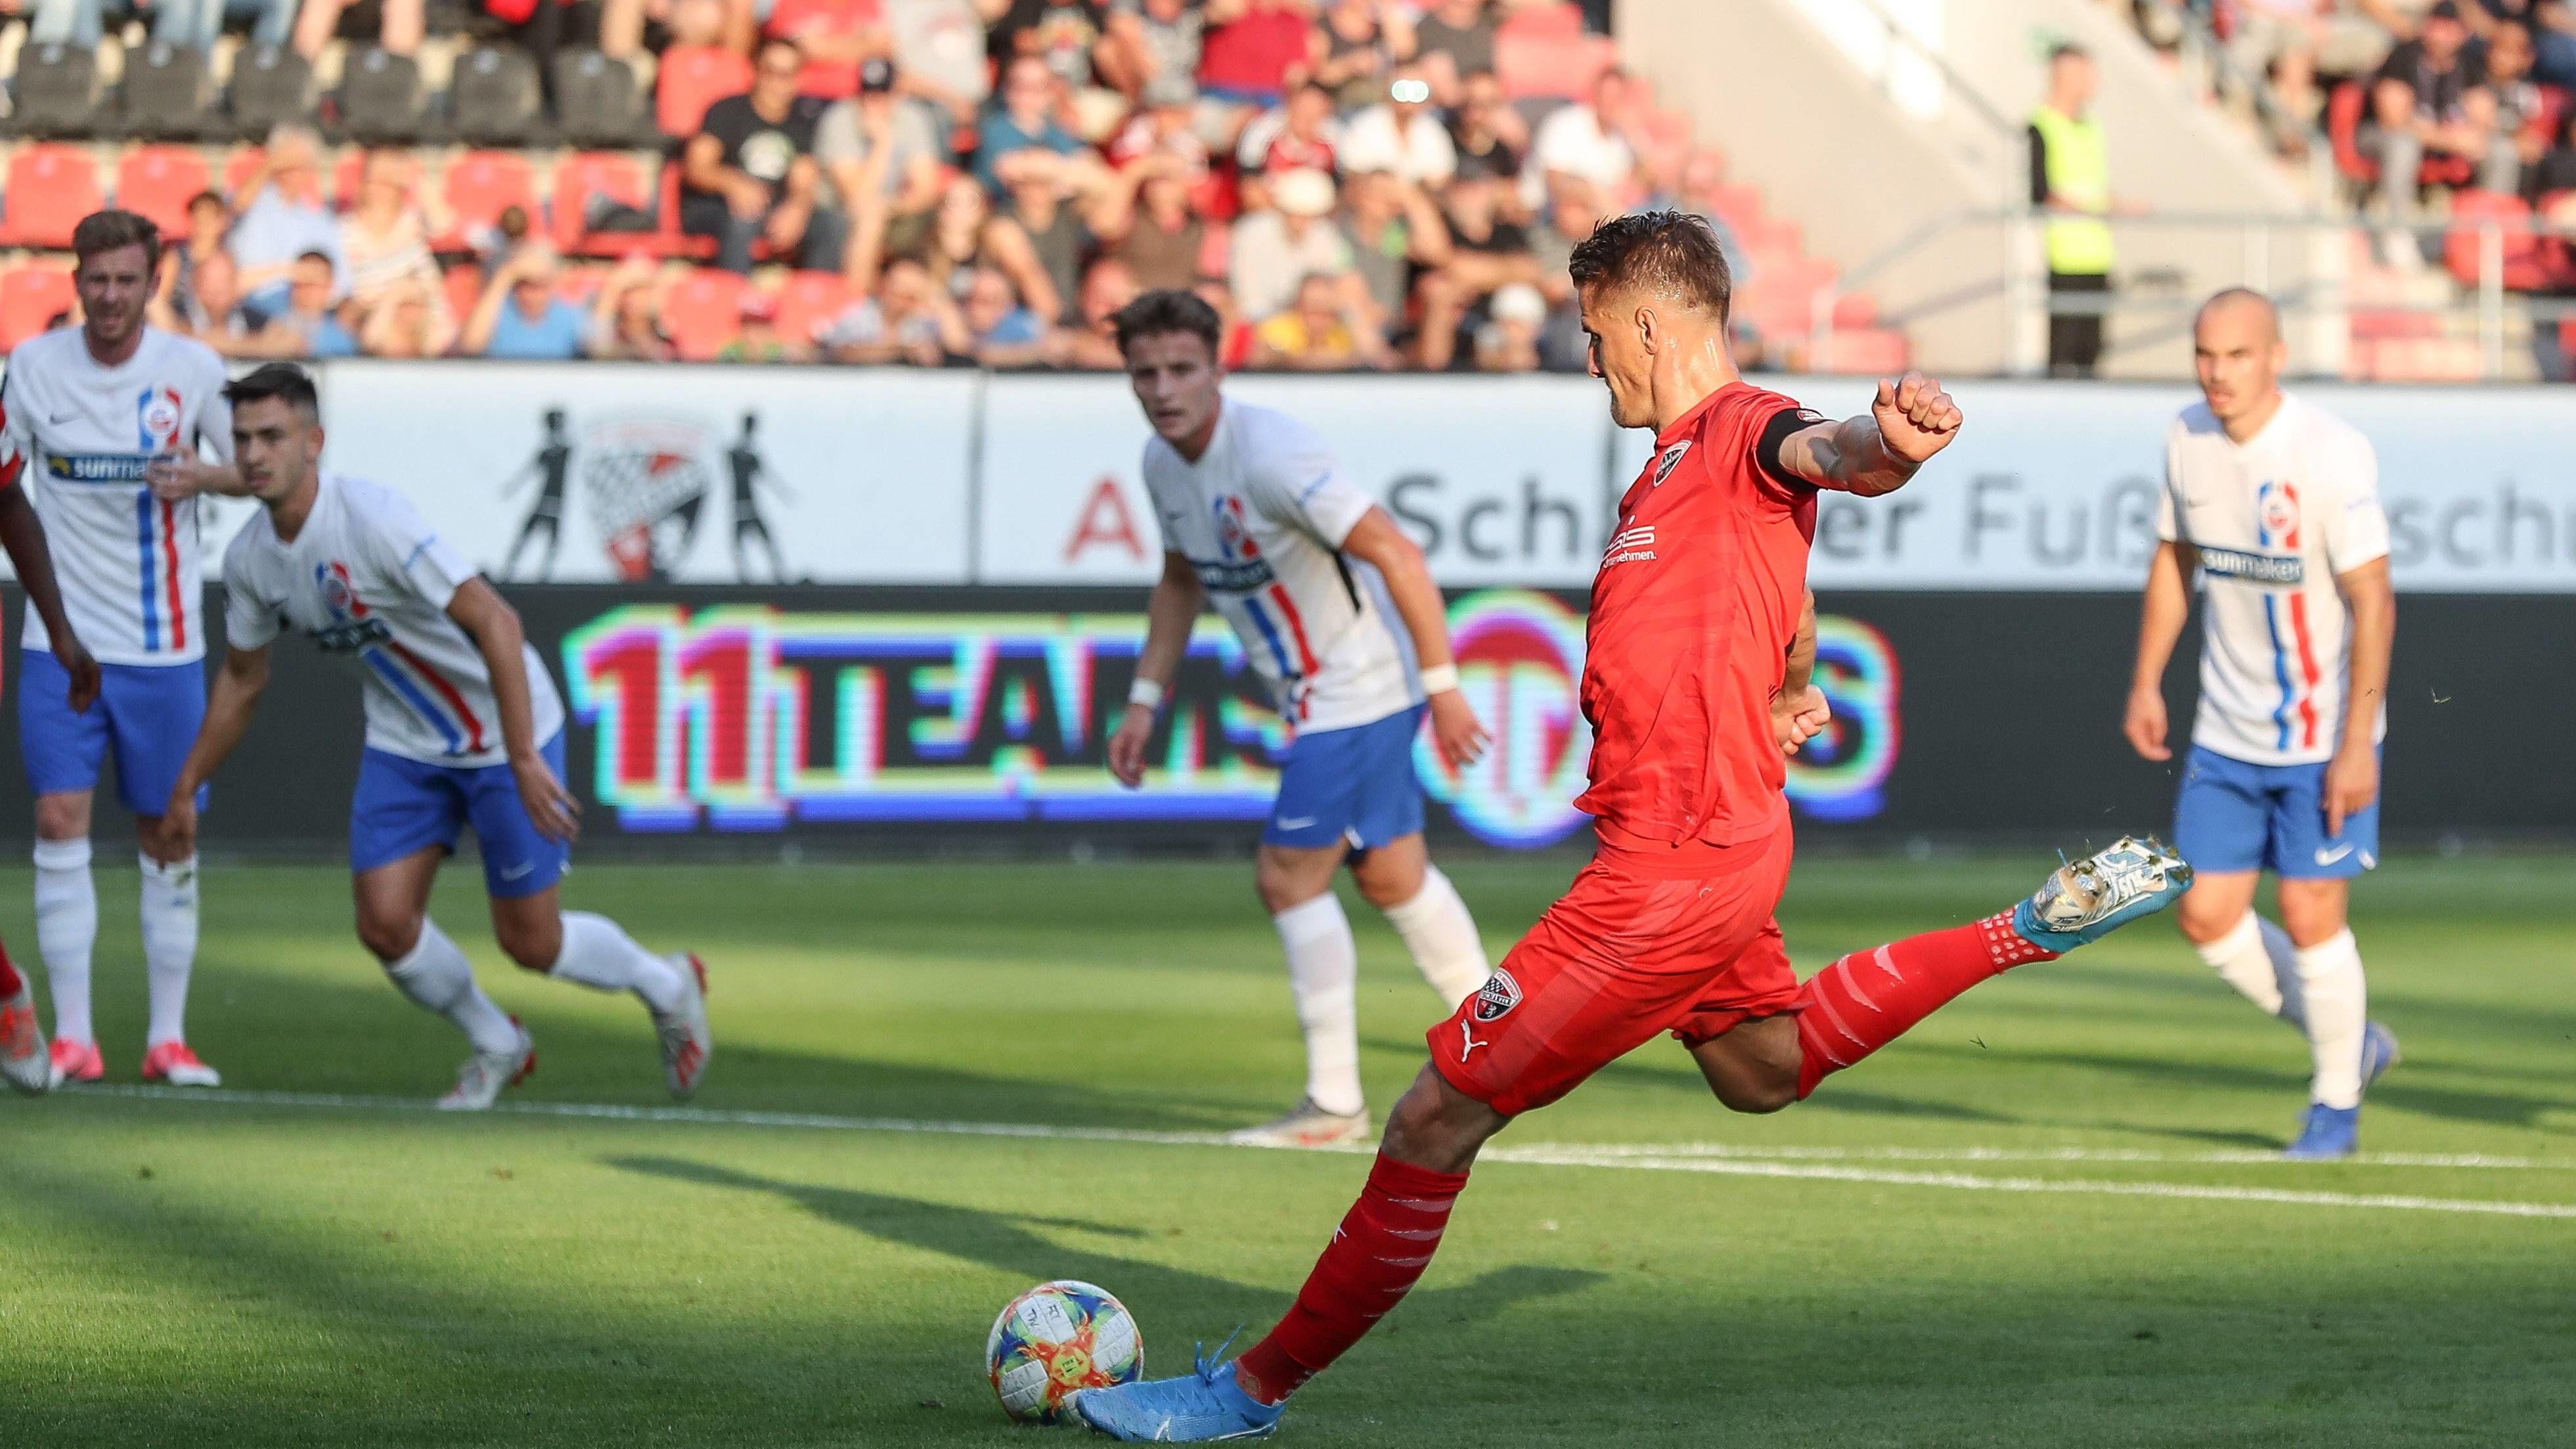 Spielbericht   FC Ingolstadt 04 - Hansa Rostock 2:2   6. Spieltag   3. Liga 2019/20 - kicker